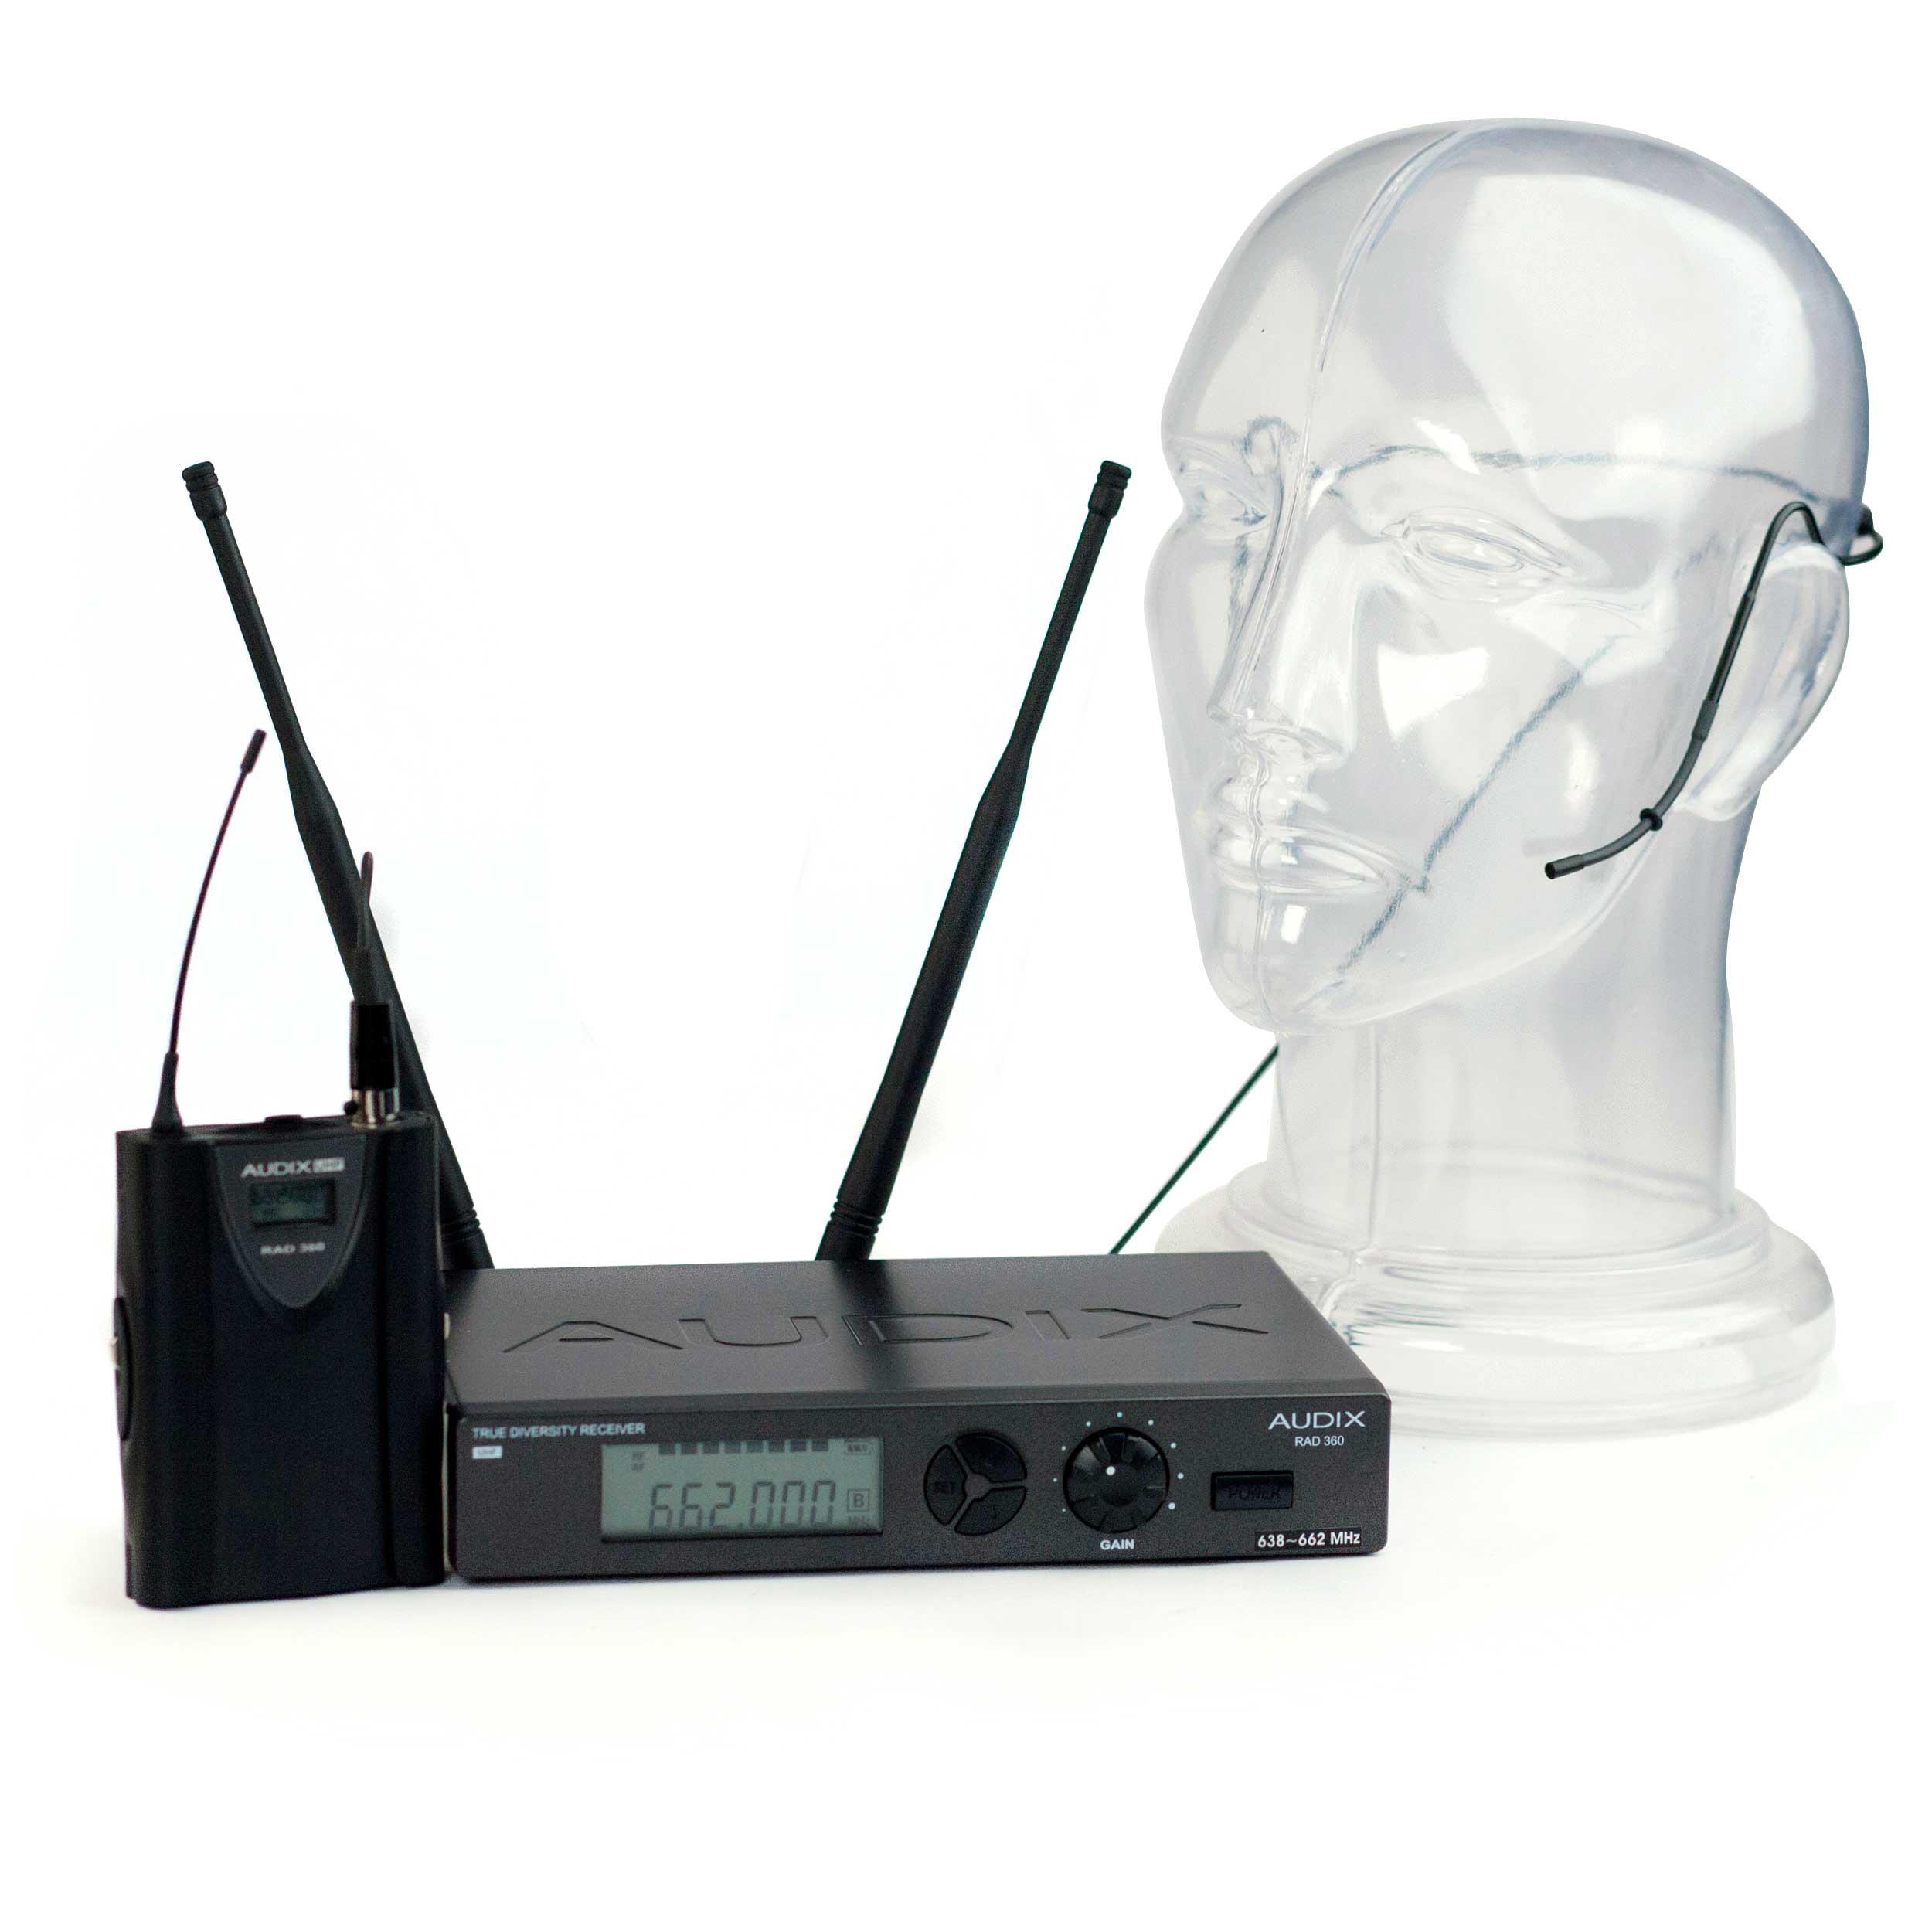 Audix RAD360 HT5 Headset